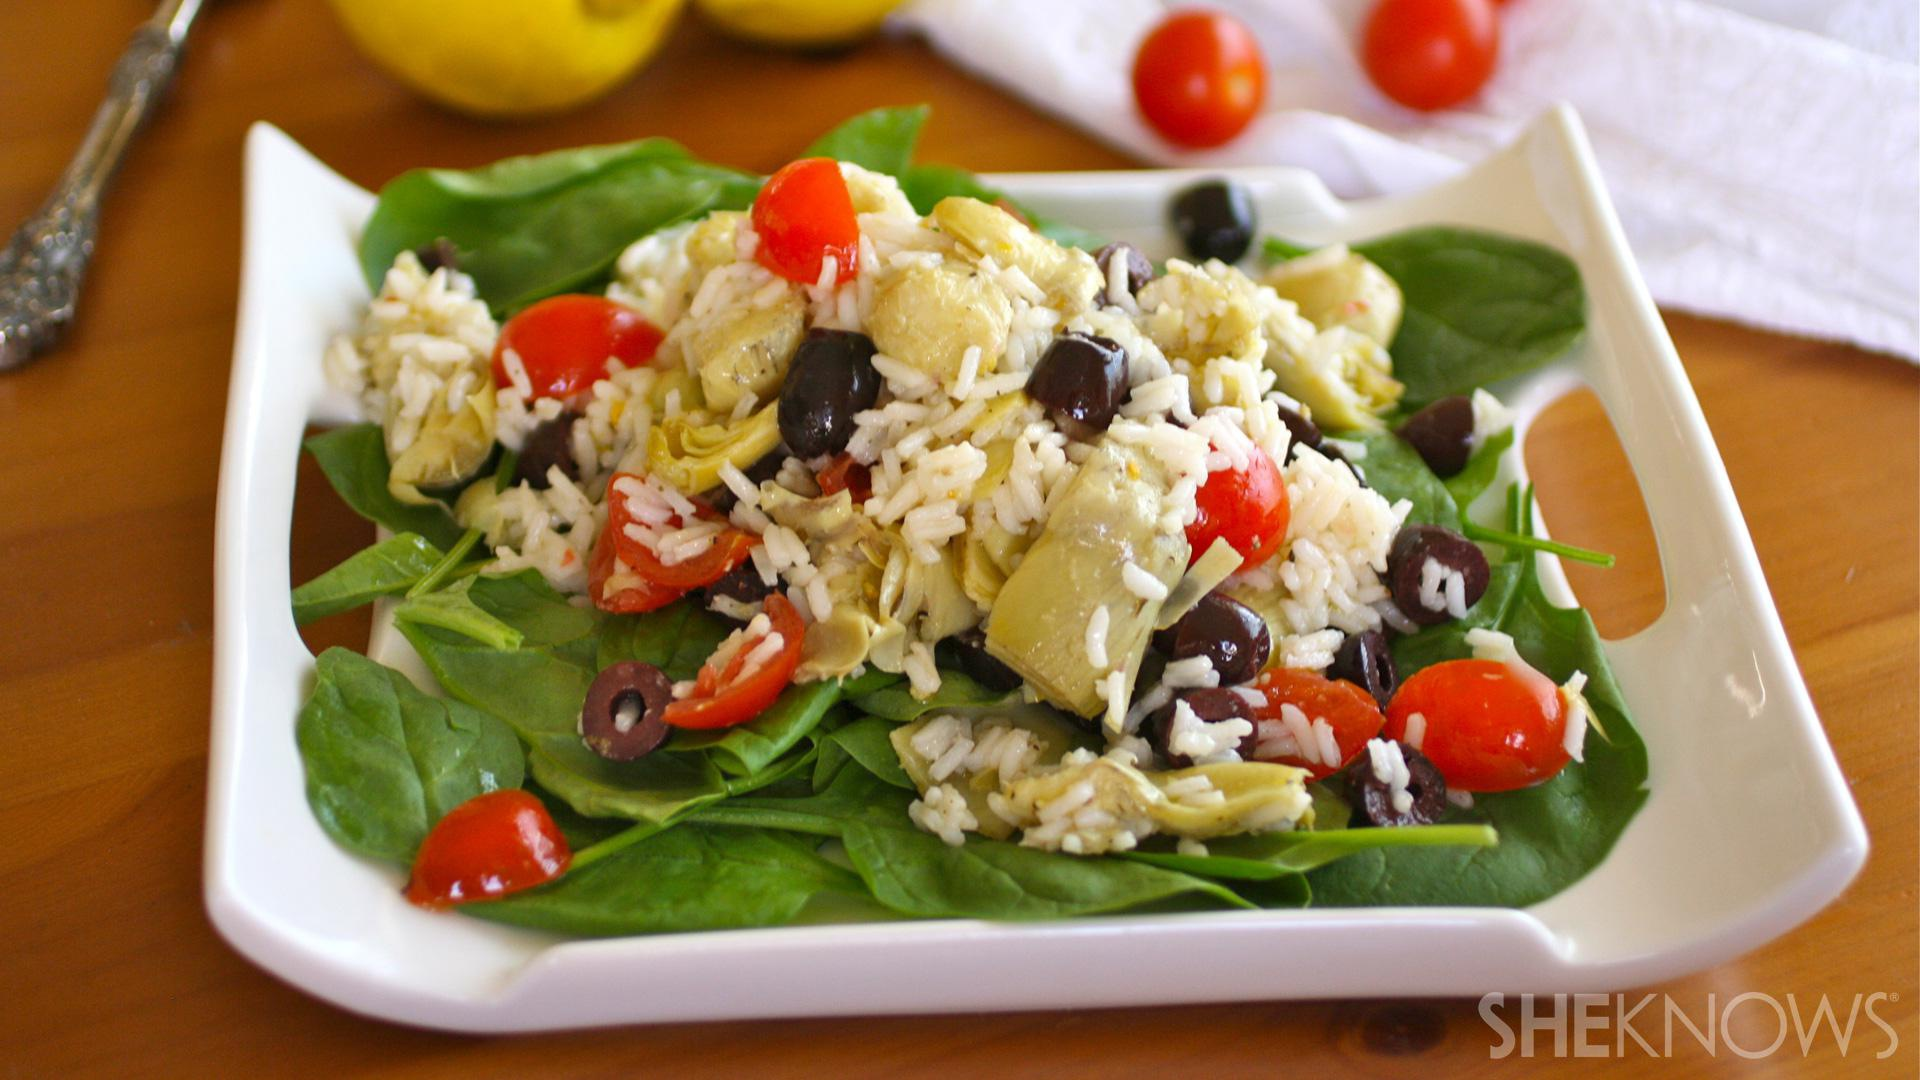 Gluten-free artichoke and rice salad with lemon-pepper dressing